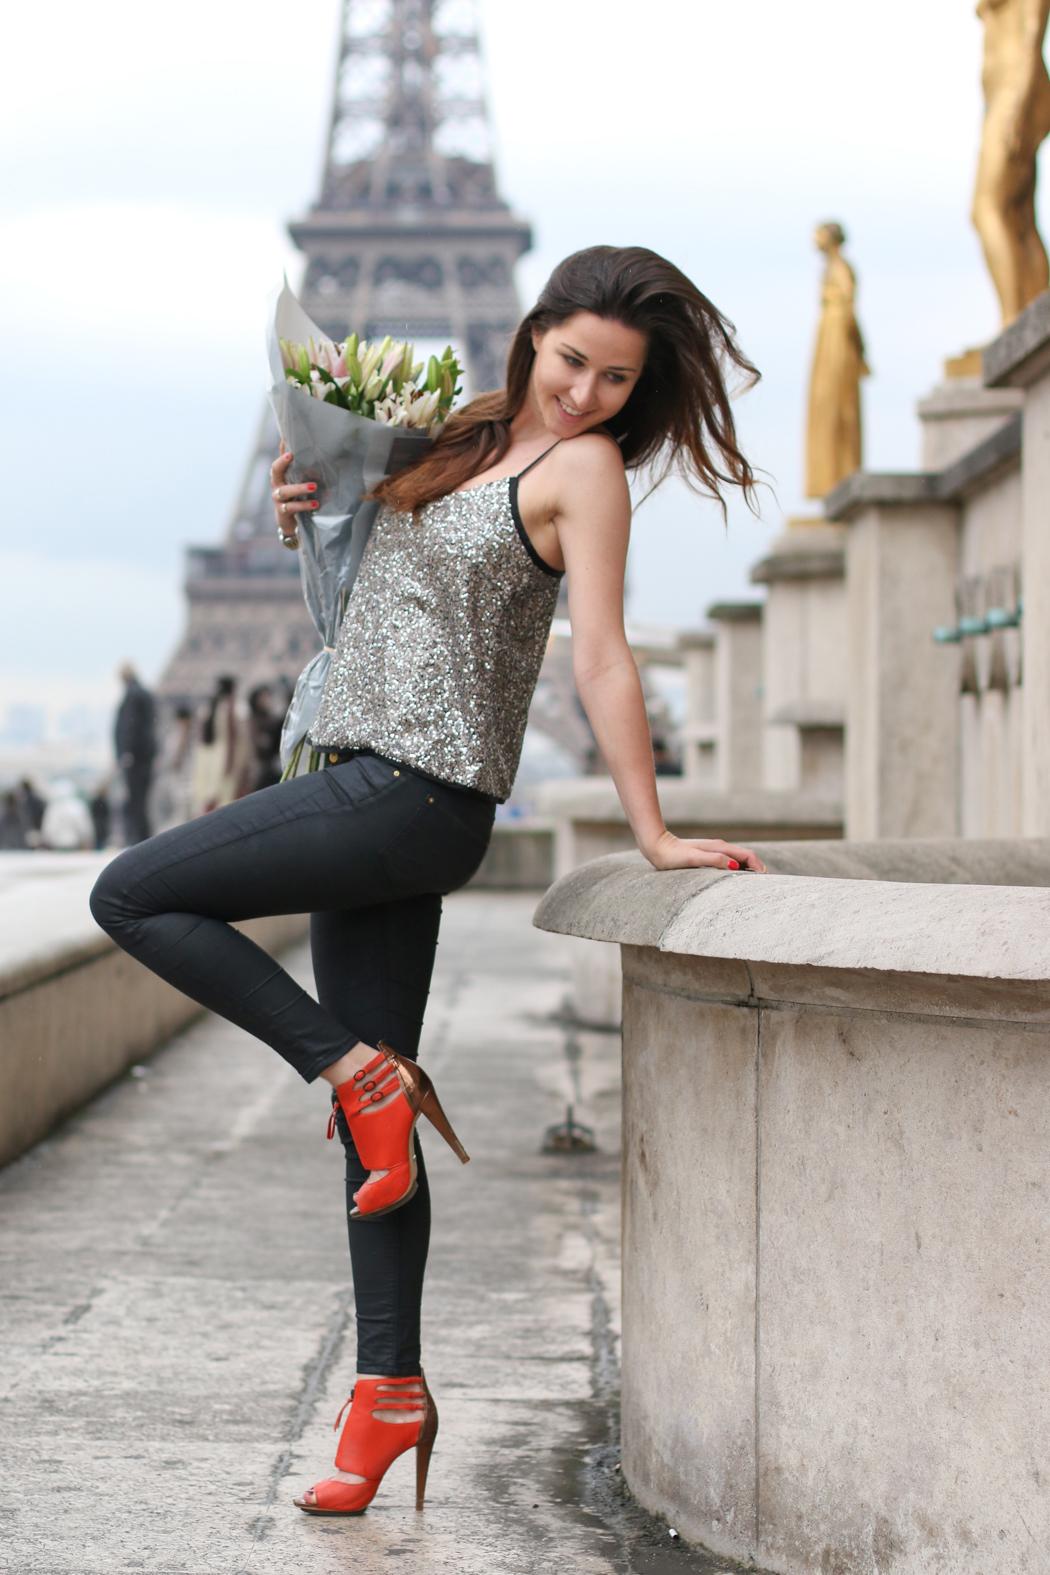 Lindarella-Fashionblogger-Buffalo-Eiffelturm-München-Paris-3